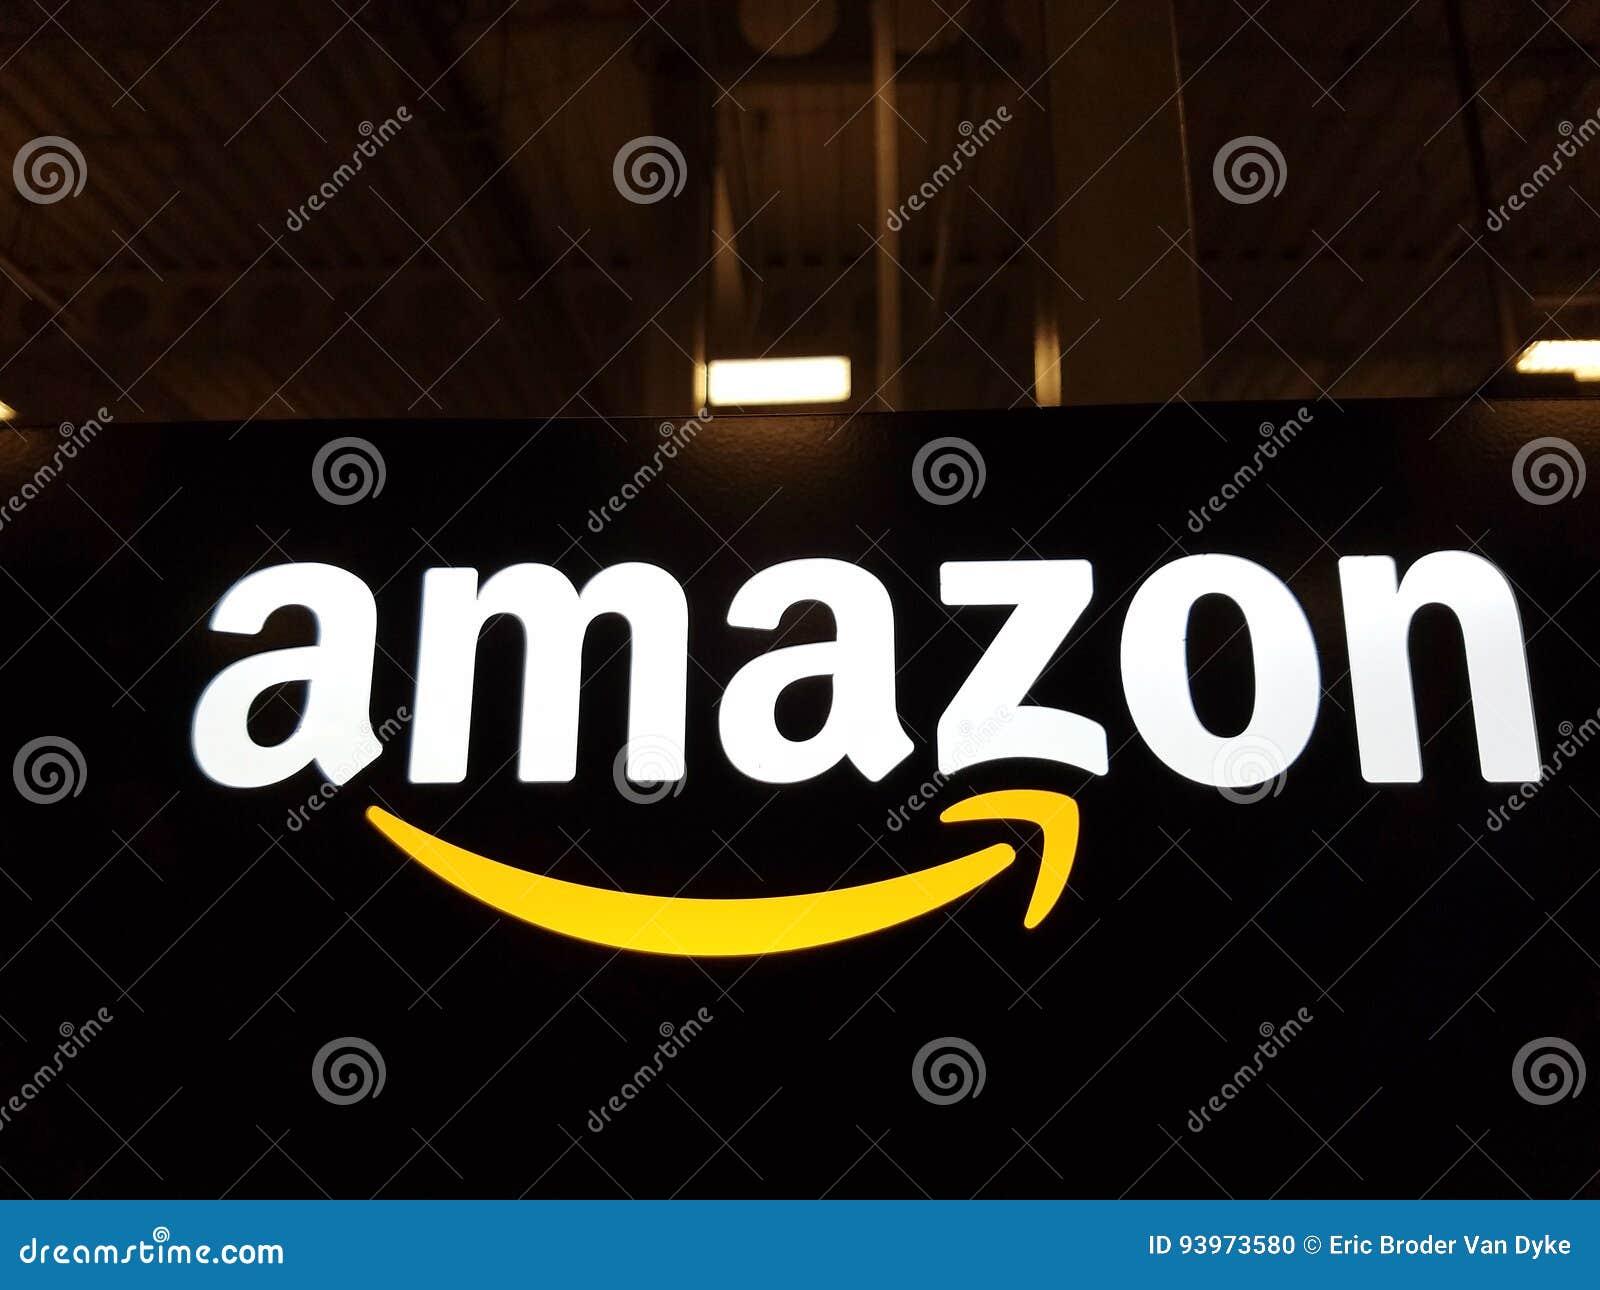 Amazonas-Logo auf schwarzer glänzender Wand in Honolulu